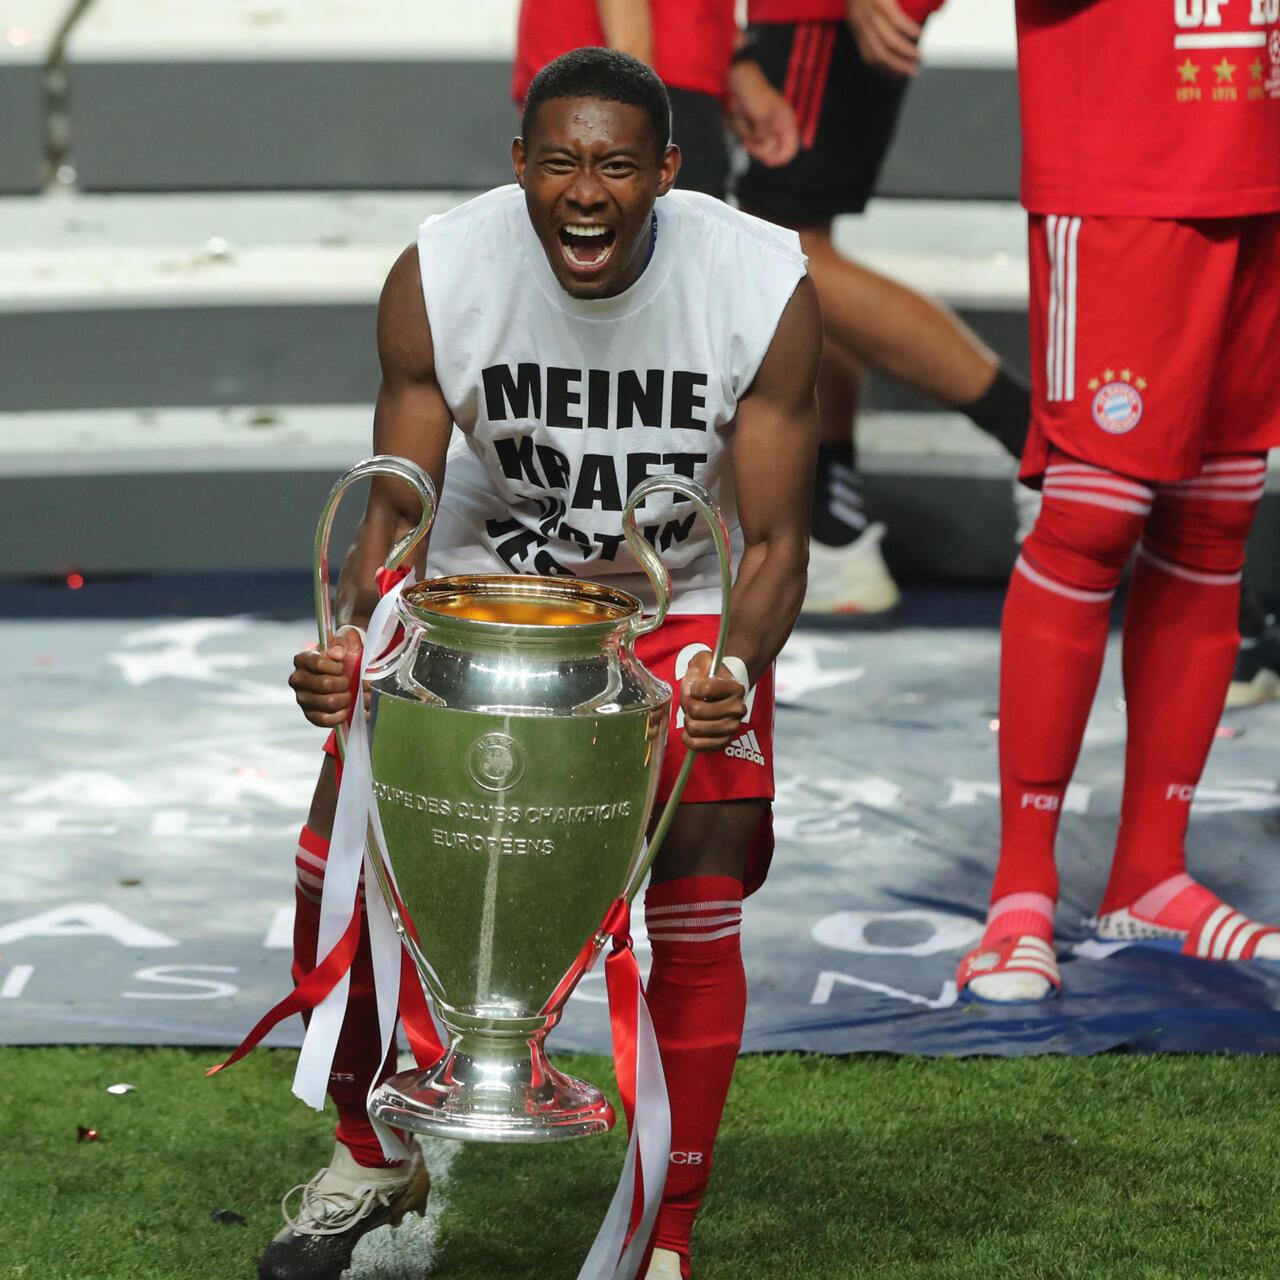 Bayern Munich Fight To Keep Hold Of Champions League Winning Squad France 24